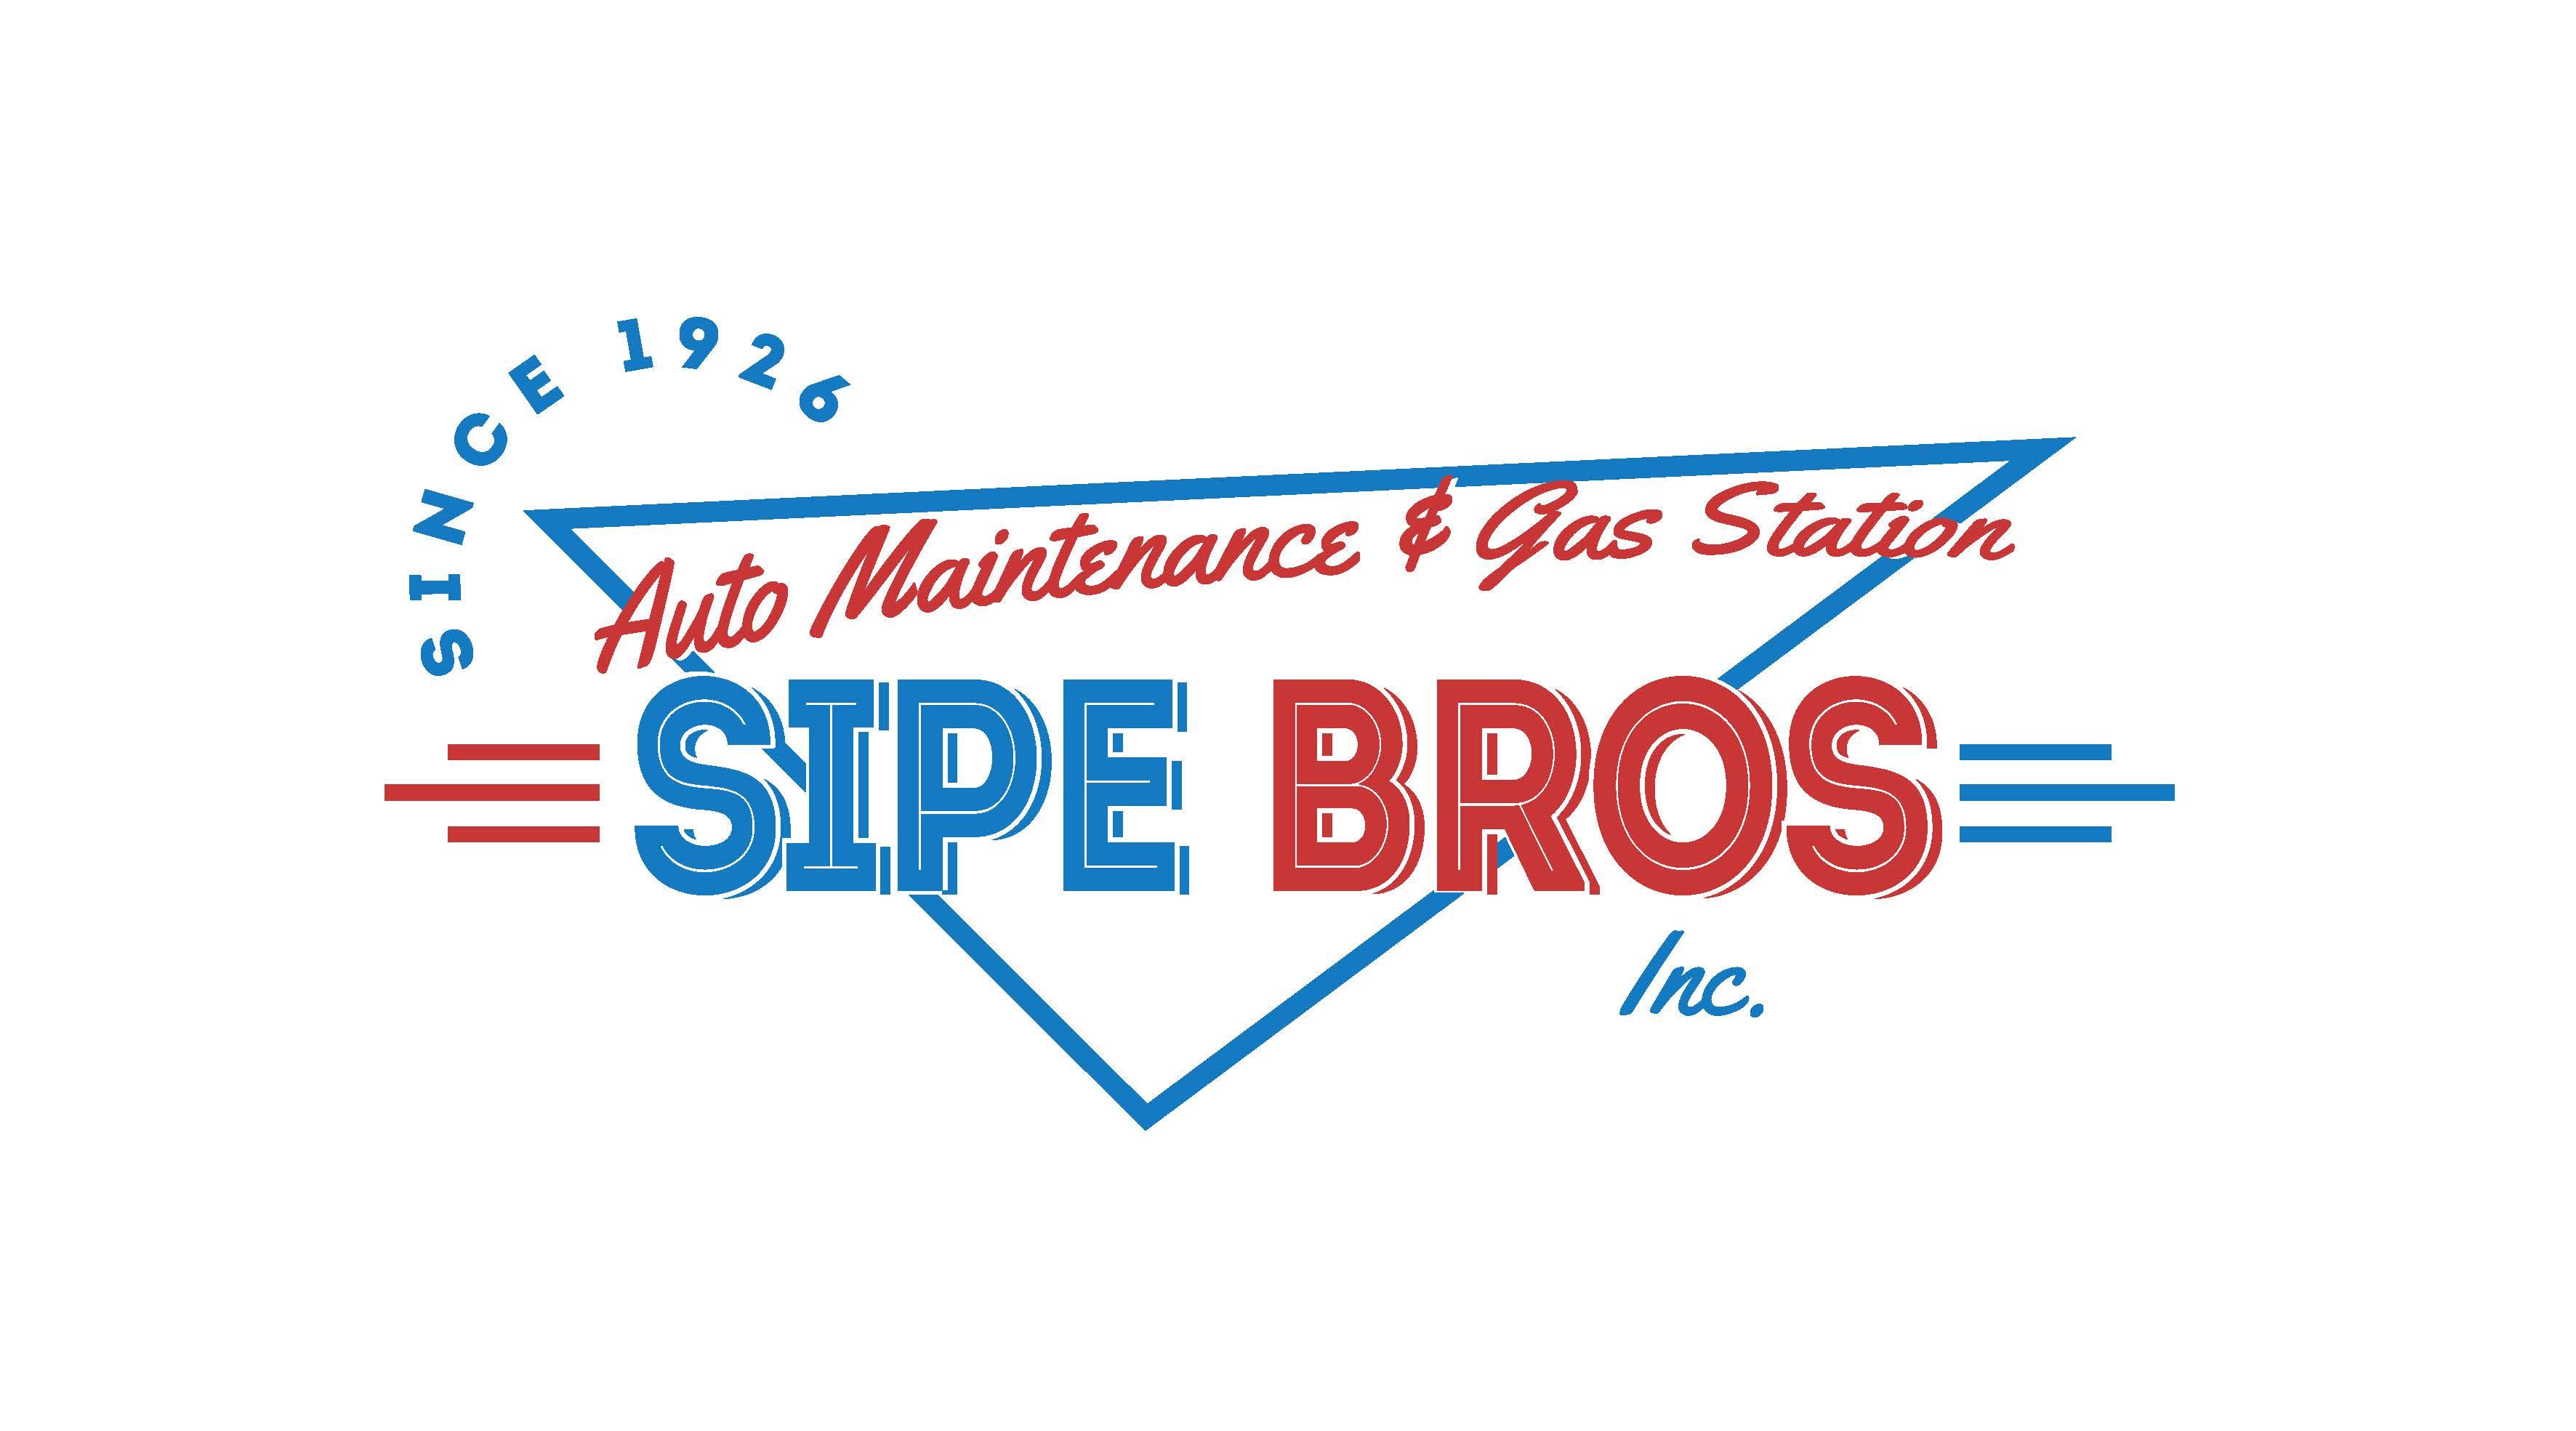 Sipe Bros